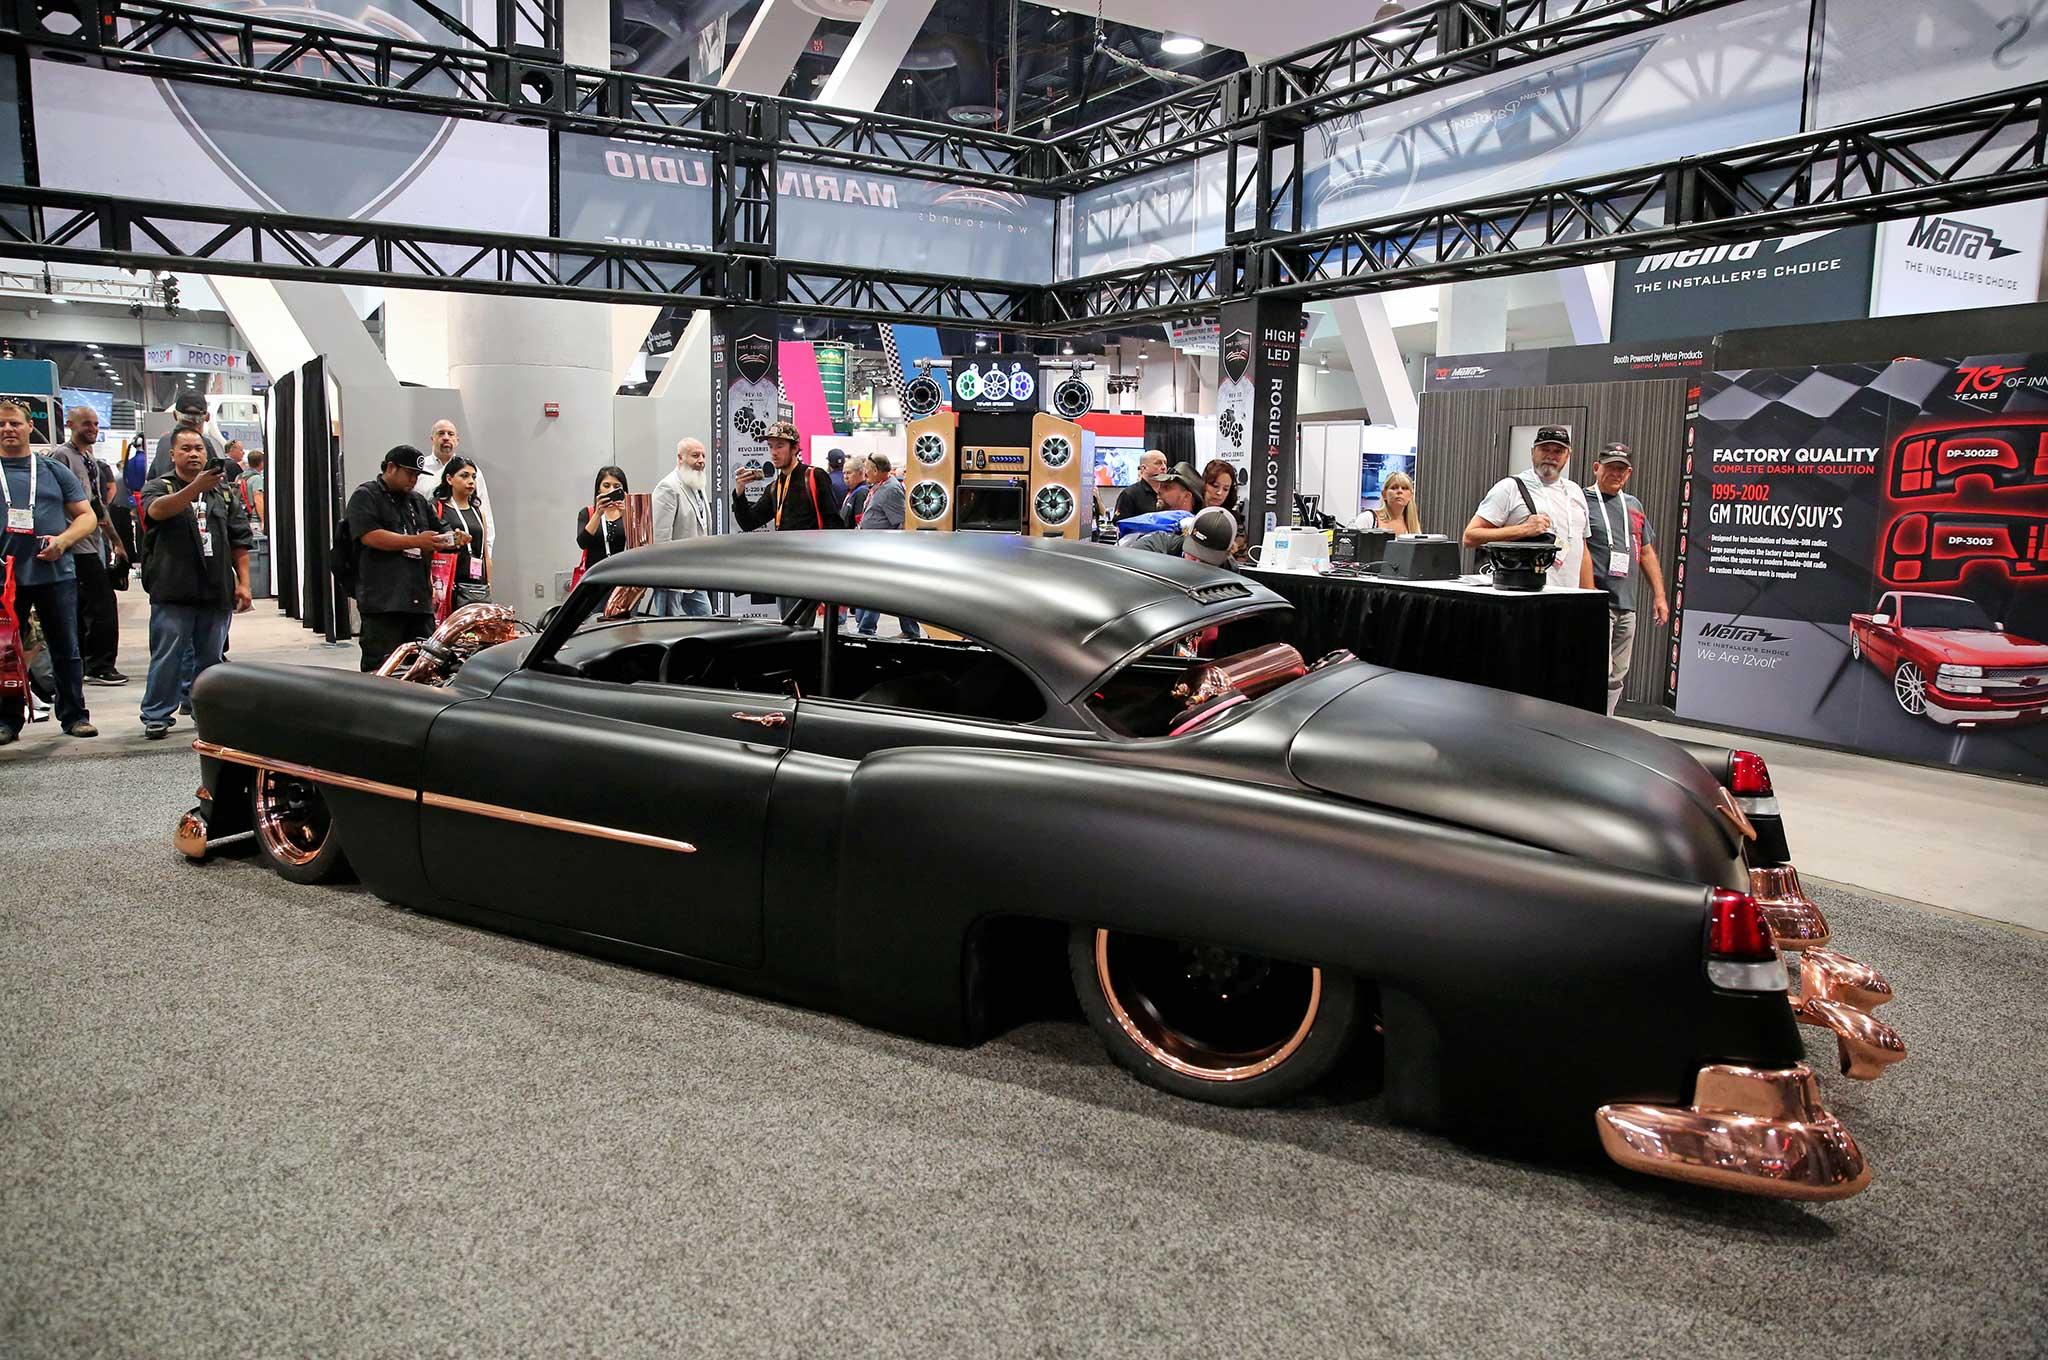 Cummins Powered 1950 Copper Cadillac At Sema 2016 Tensema16